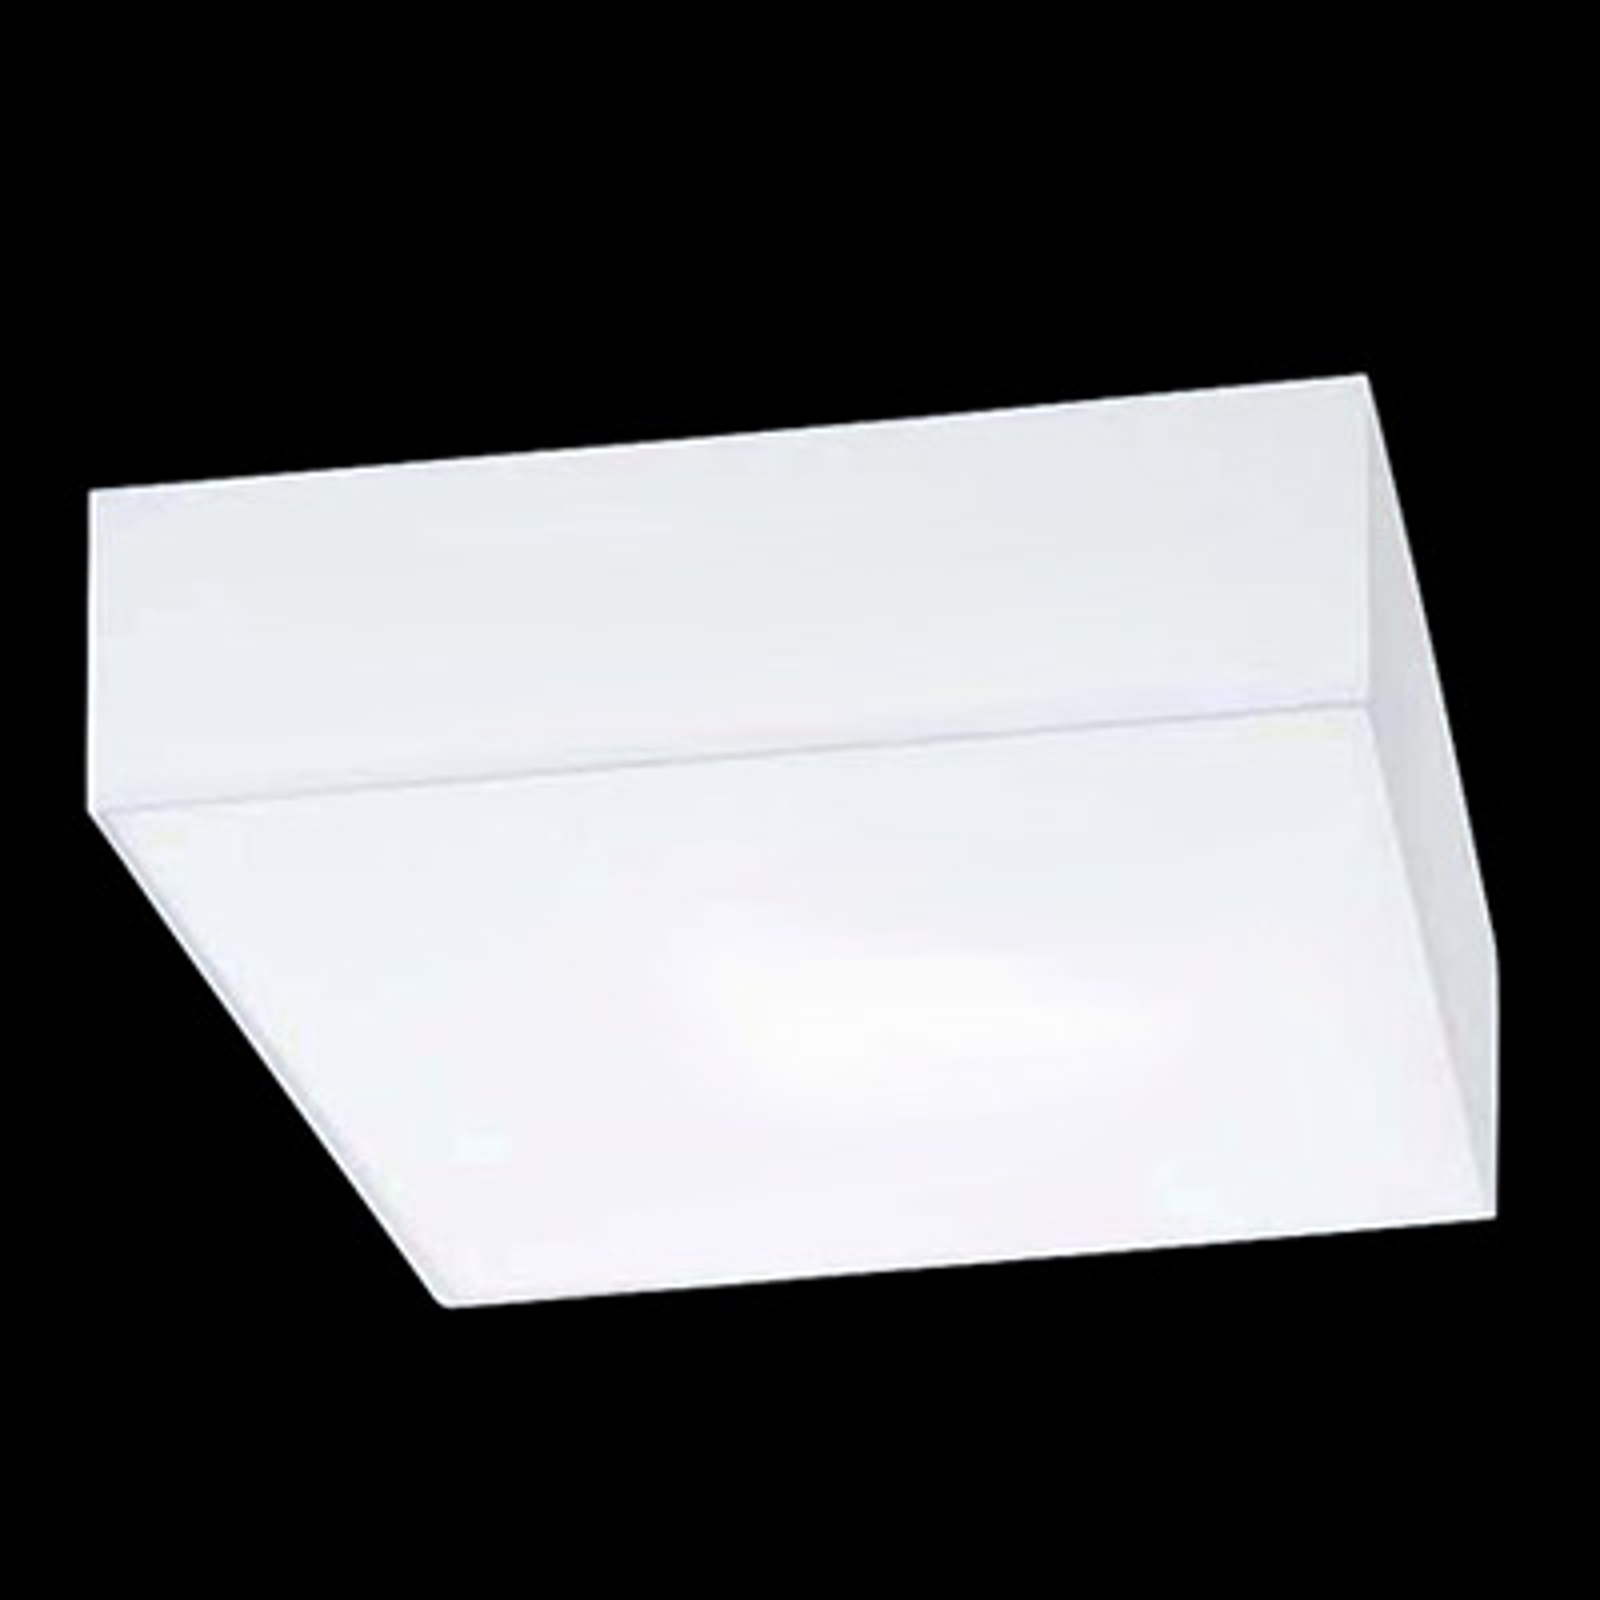 Kvadratisk taklampe Cuba Hela, hvit